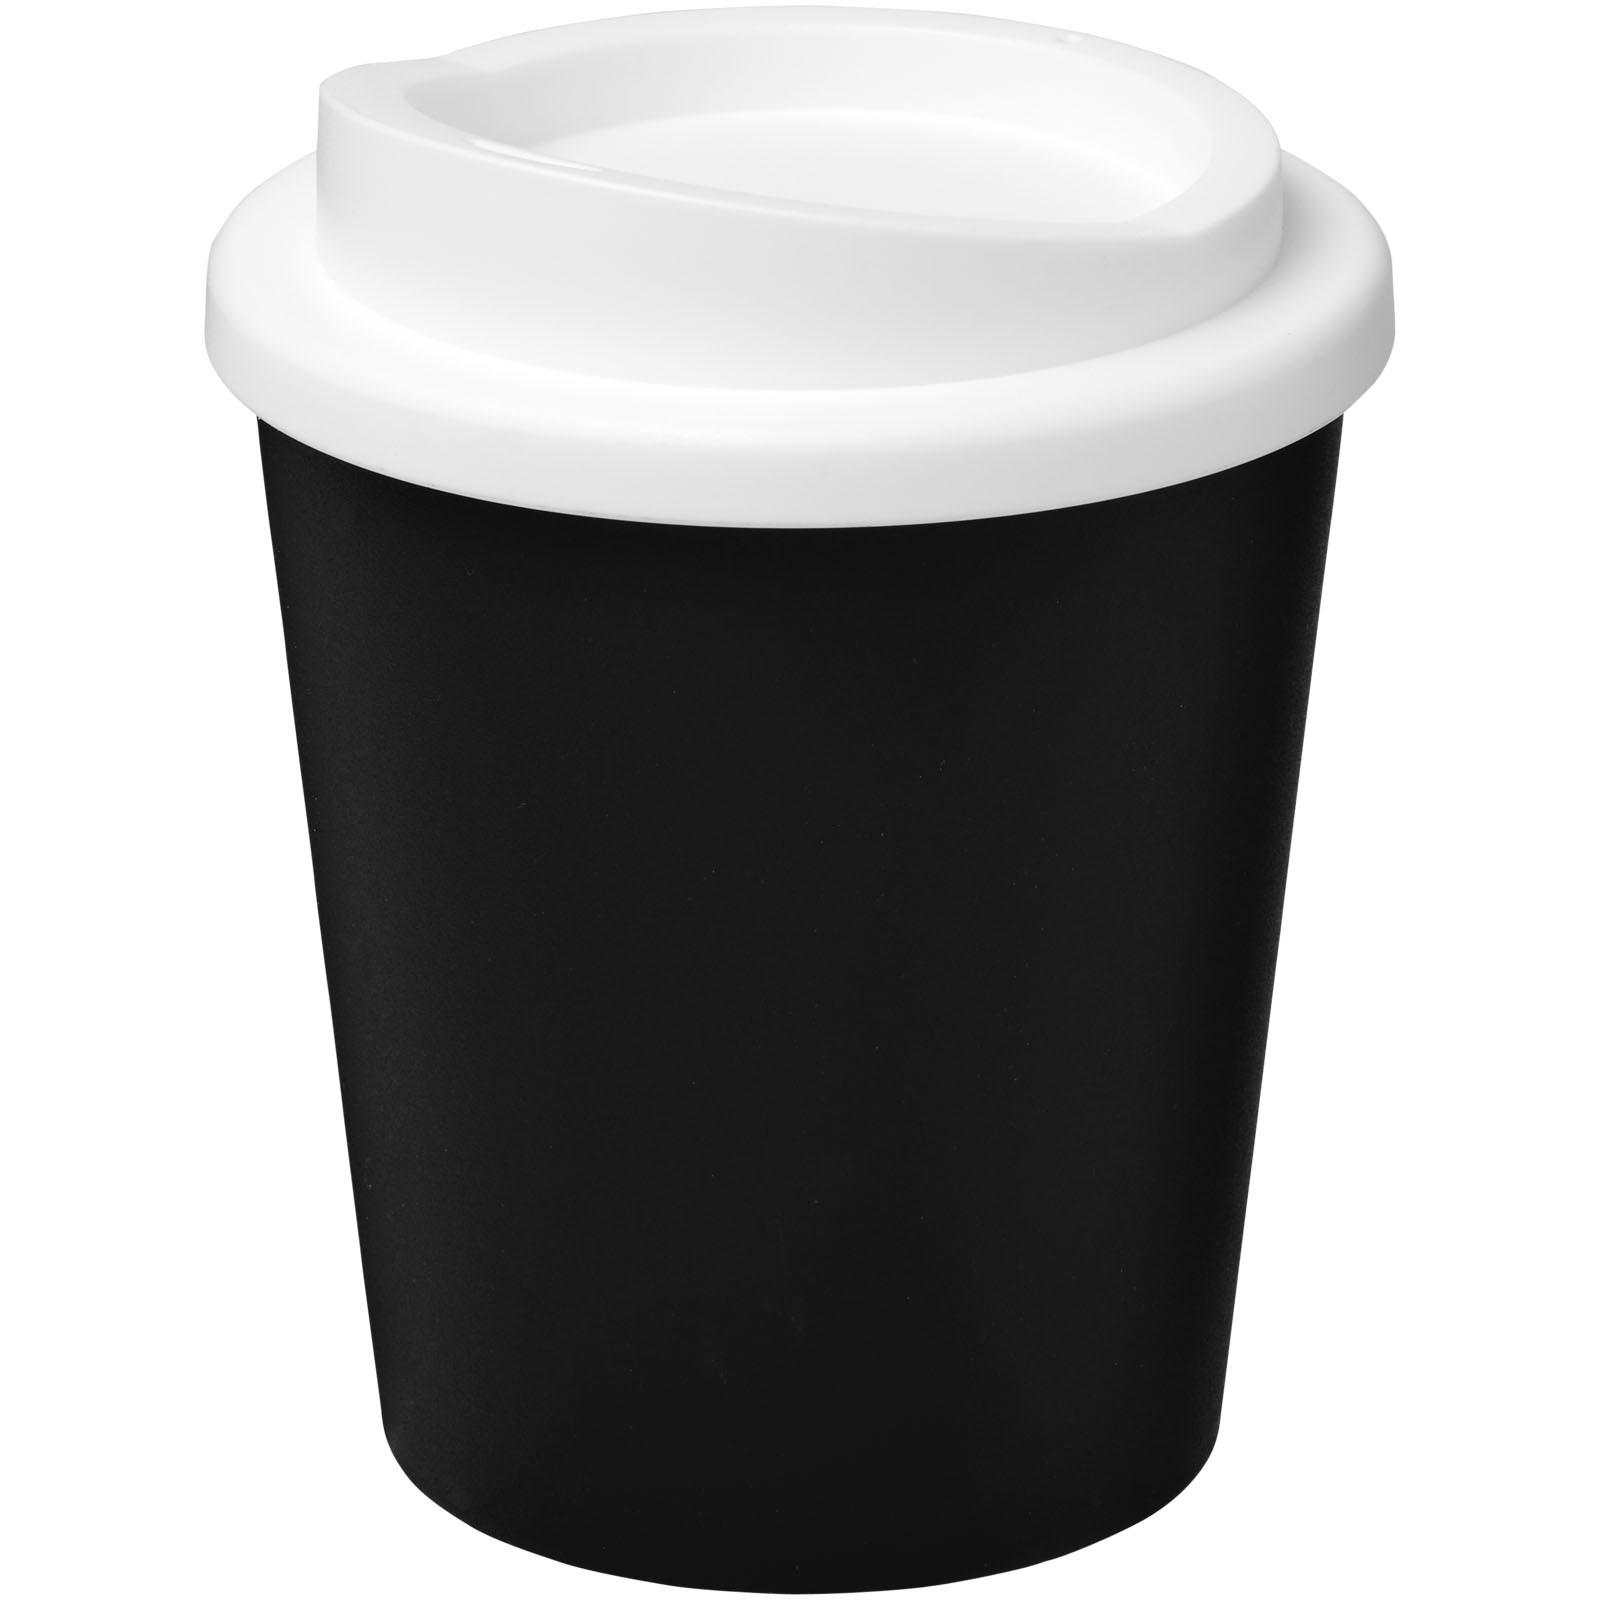 Americano® Vaso térmico Espresso de 250 ml - Negro intenso / Blanco